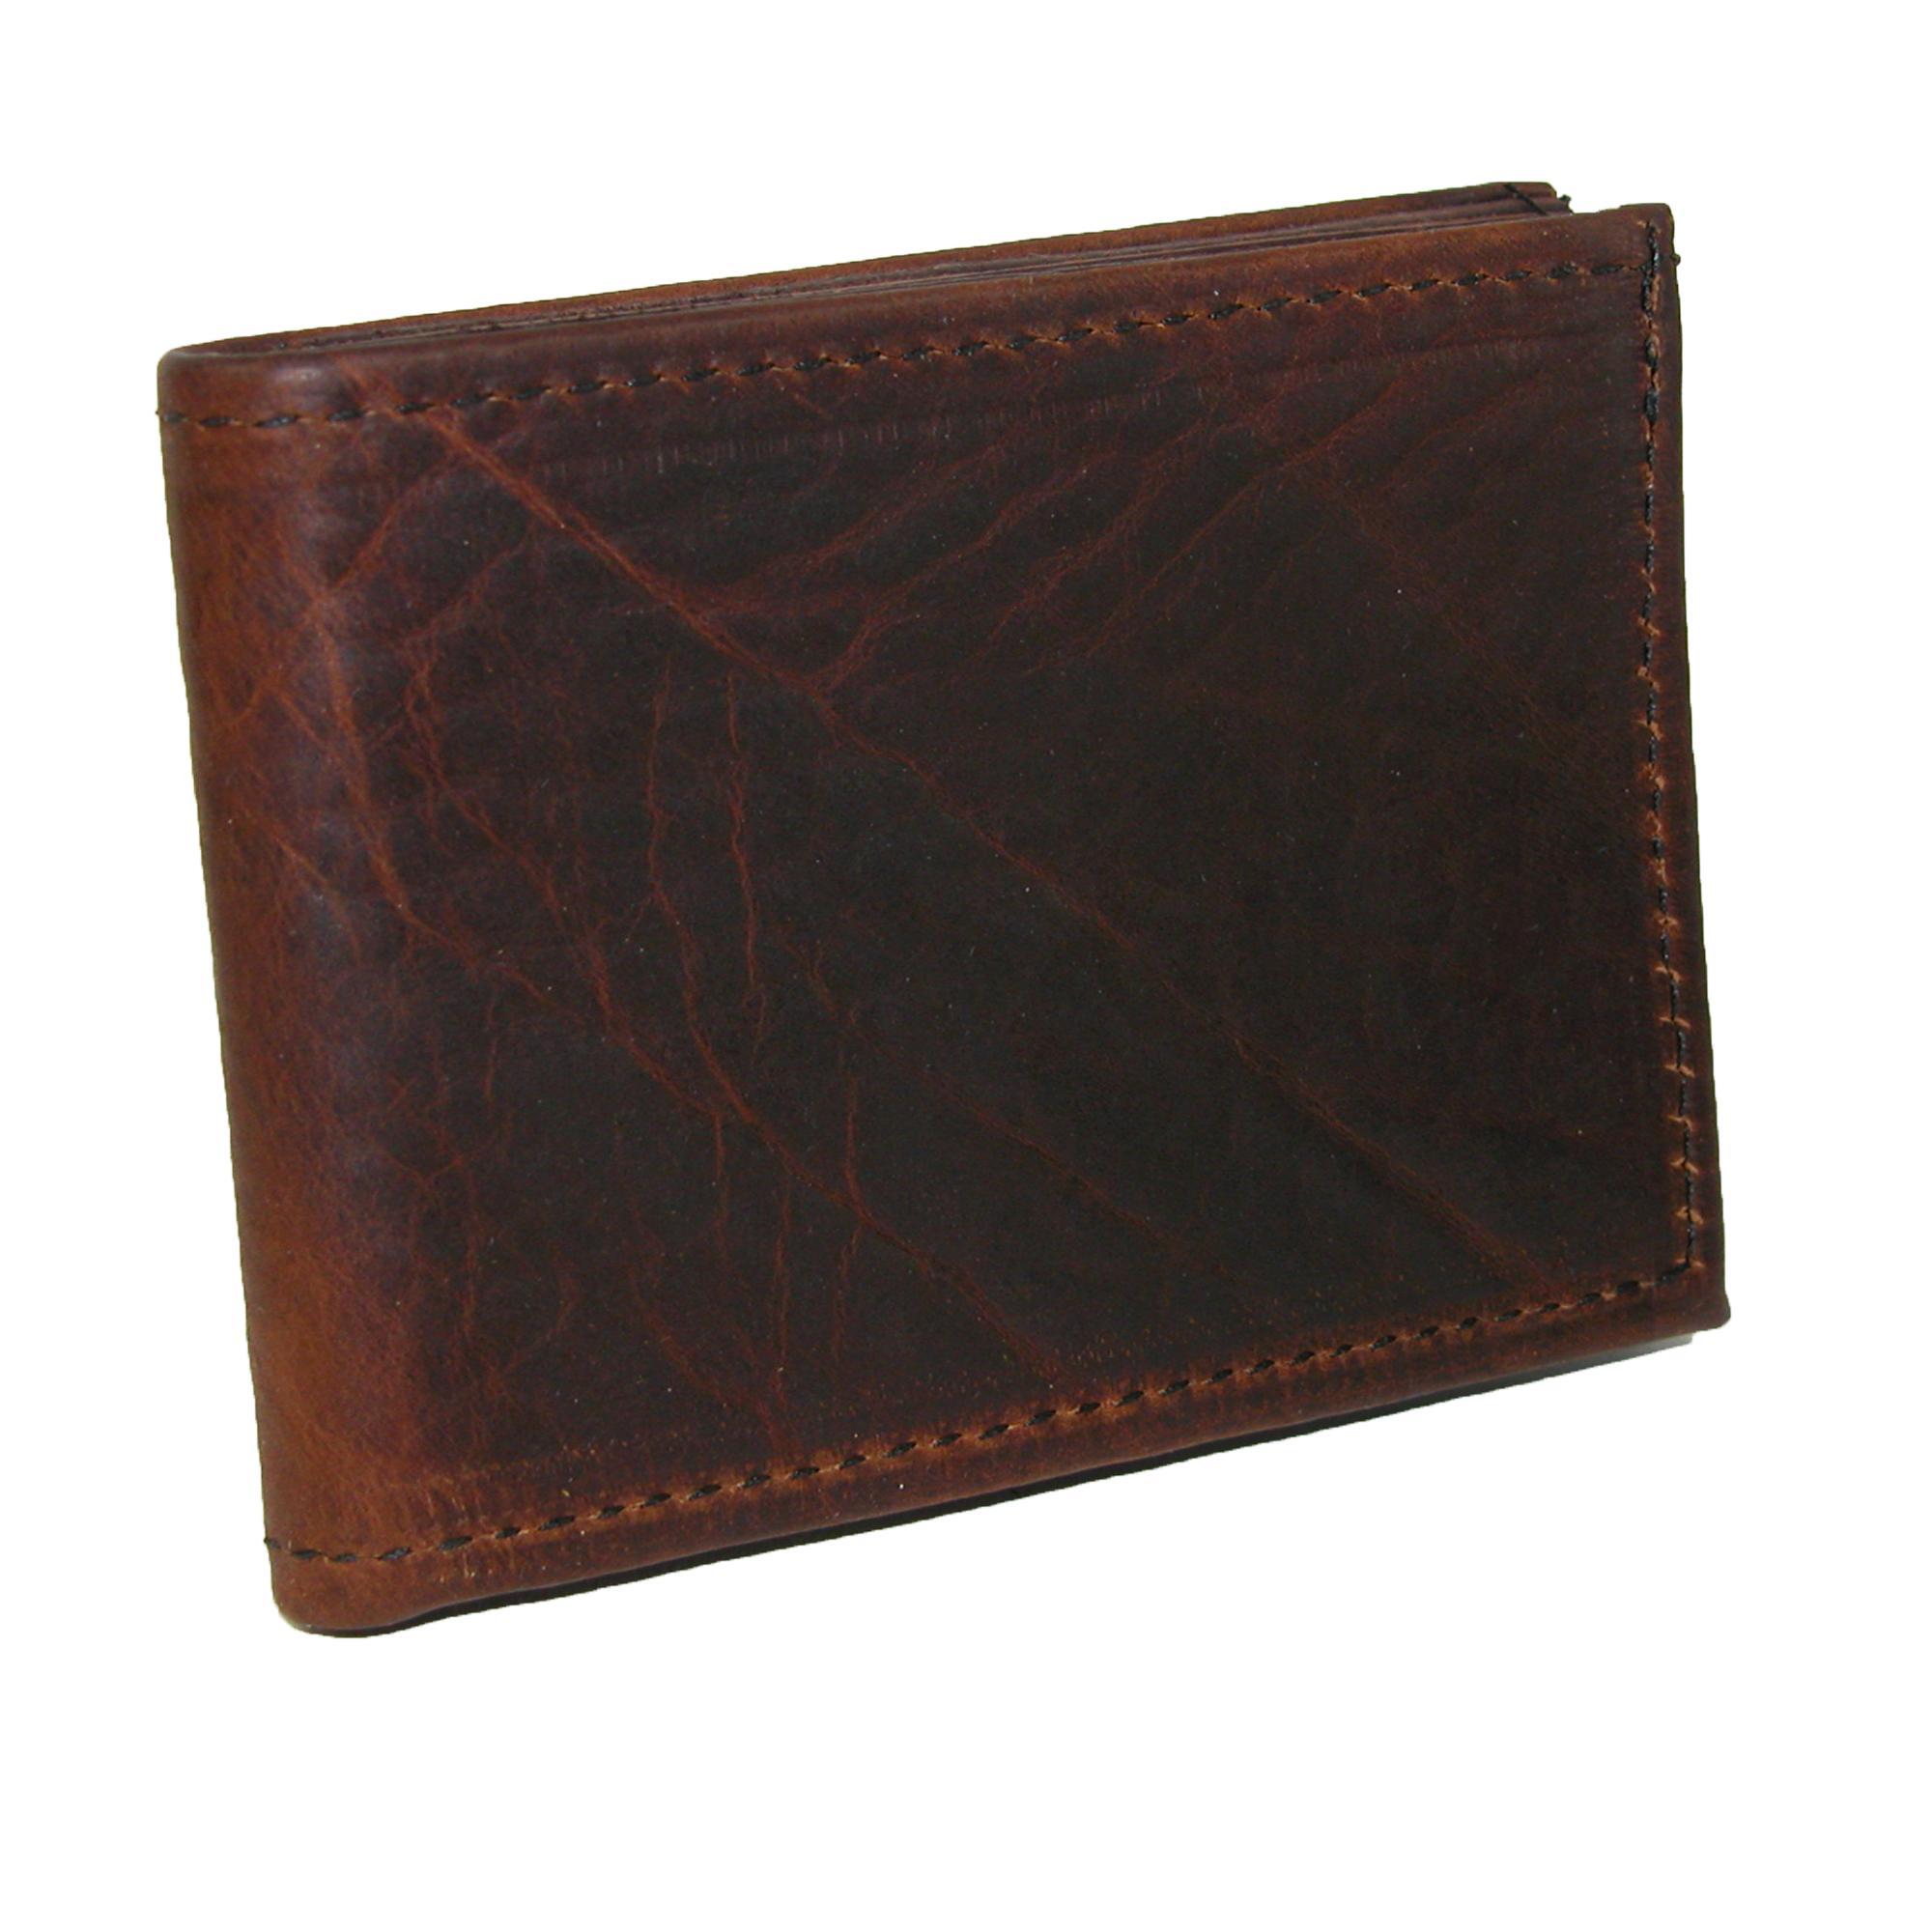 Boston Leather Mens Textured Bison Leather Billfold Wallet Dark ... ac8a4d3742